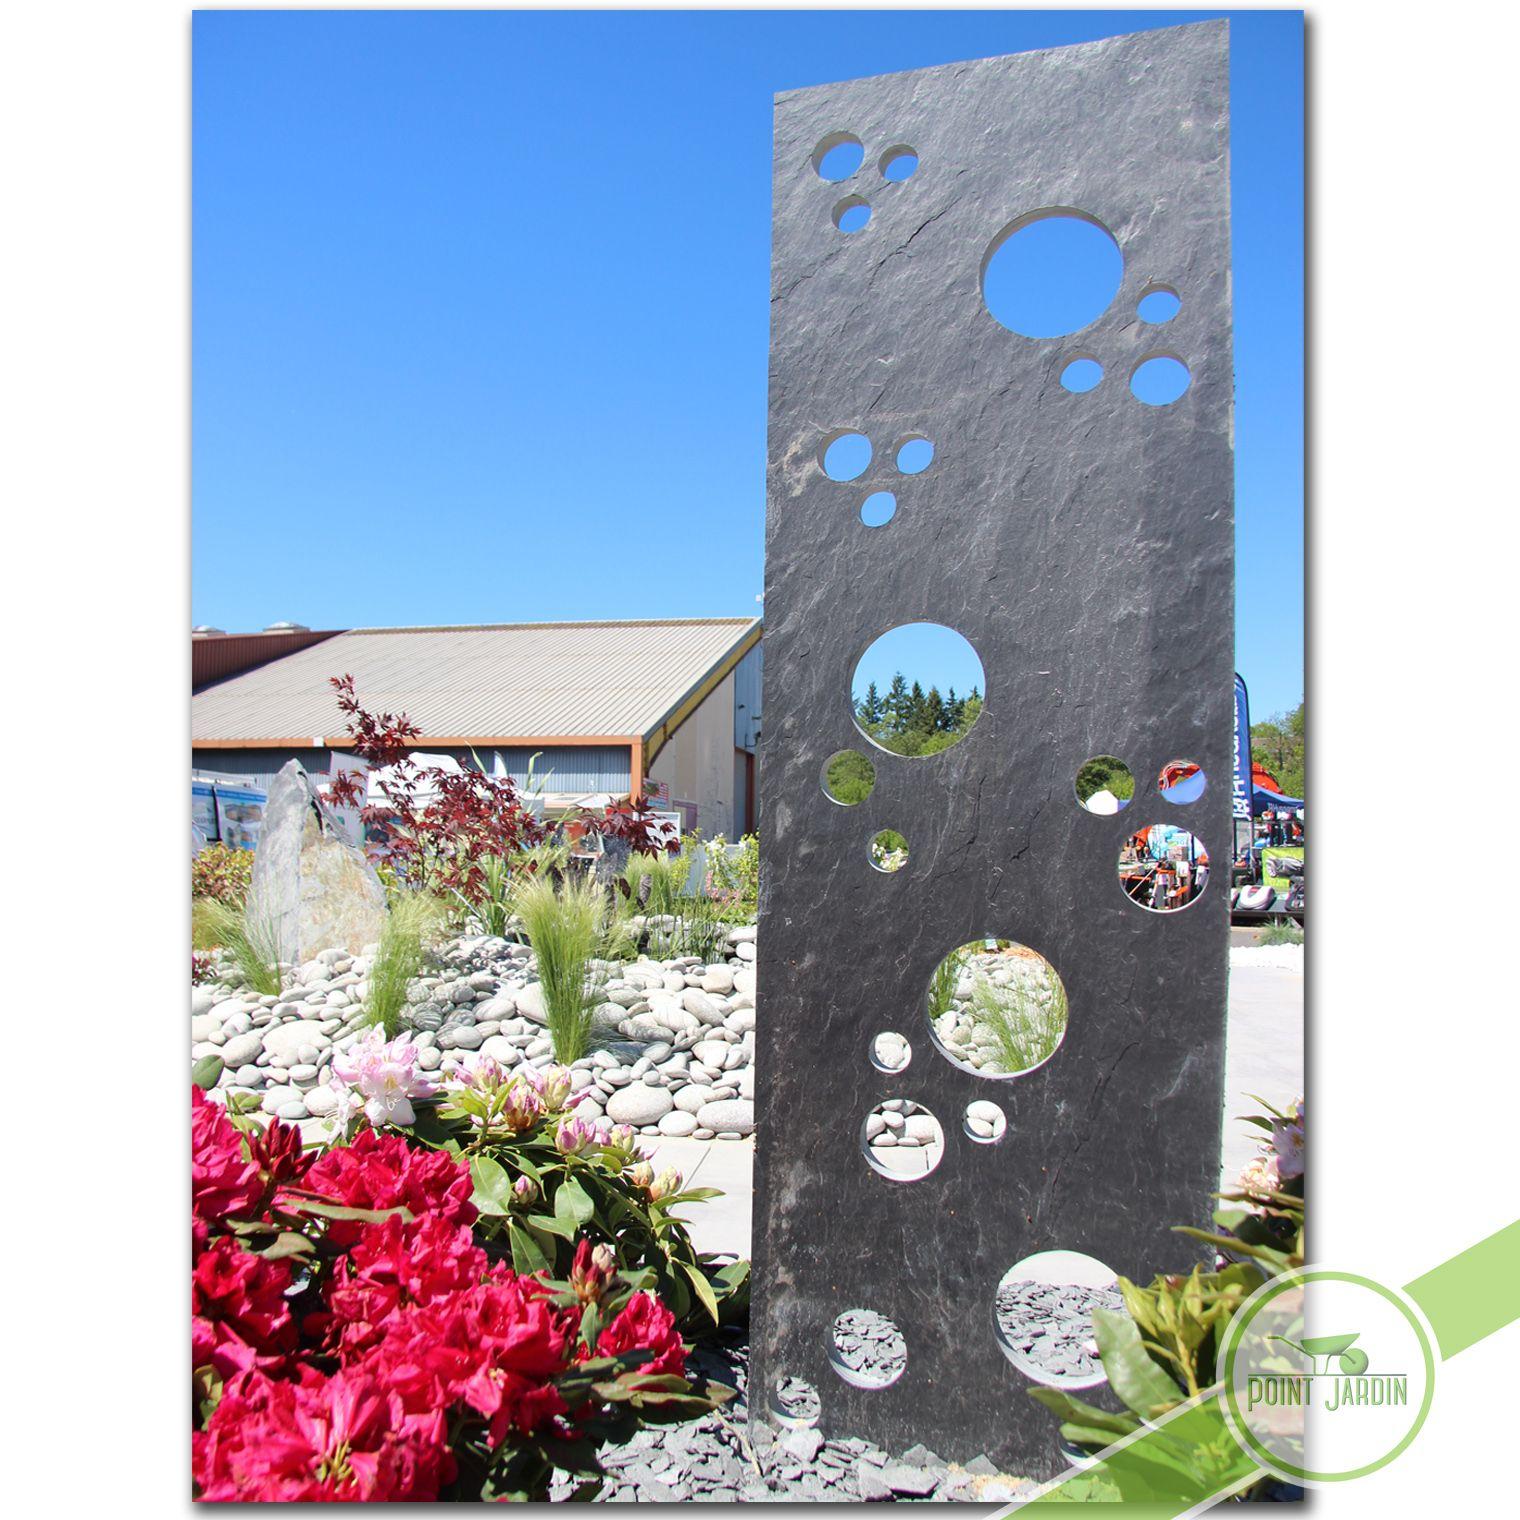 Ardoise Bulles - | Jardin Contemporain, Déco Jardin, Idee ... dedans Idee Deco Jardin Avec Ardoise